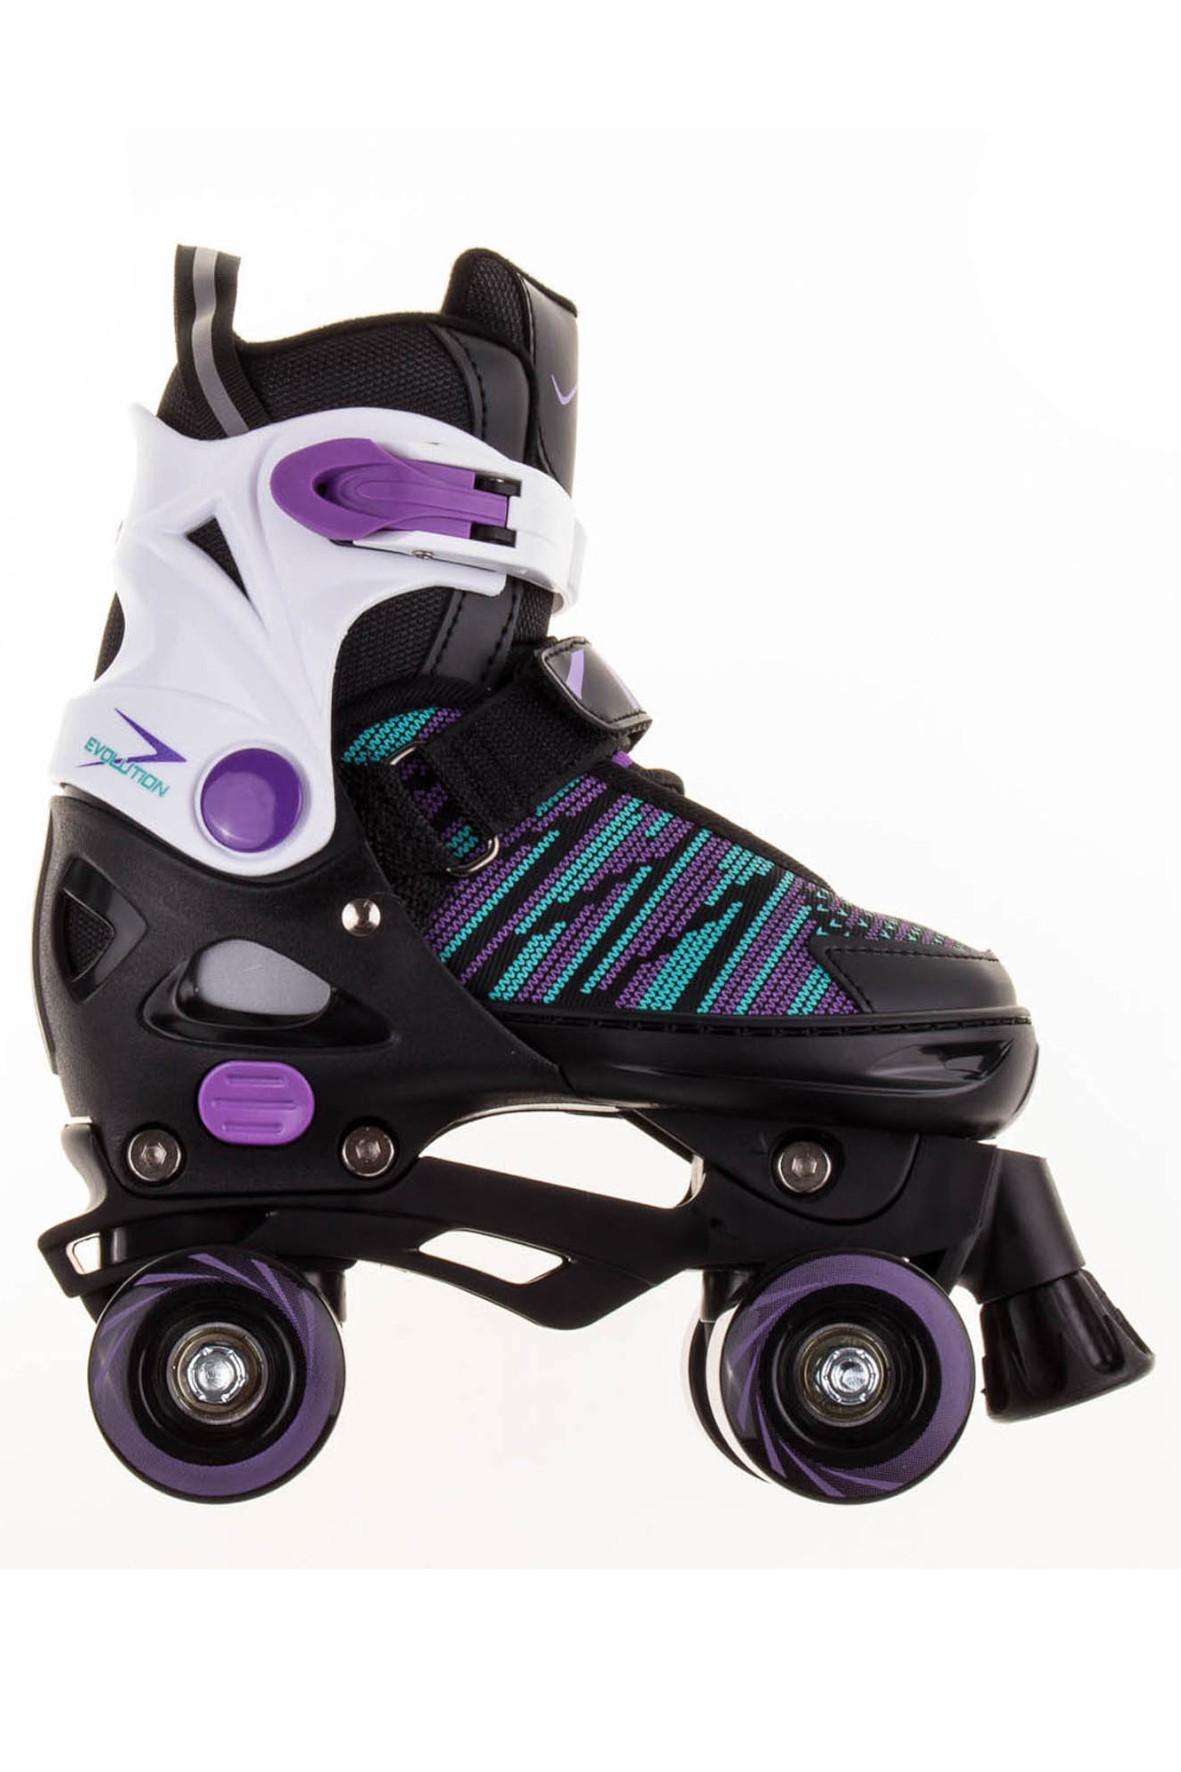 Wrotki Vivo Dark black/violet rozmiar 29-32